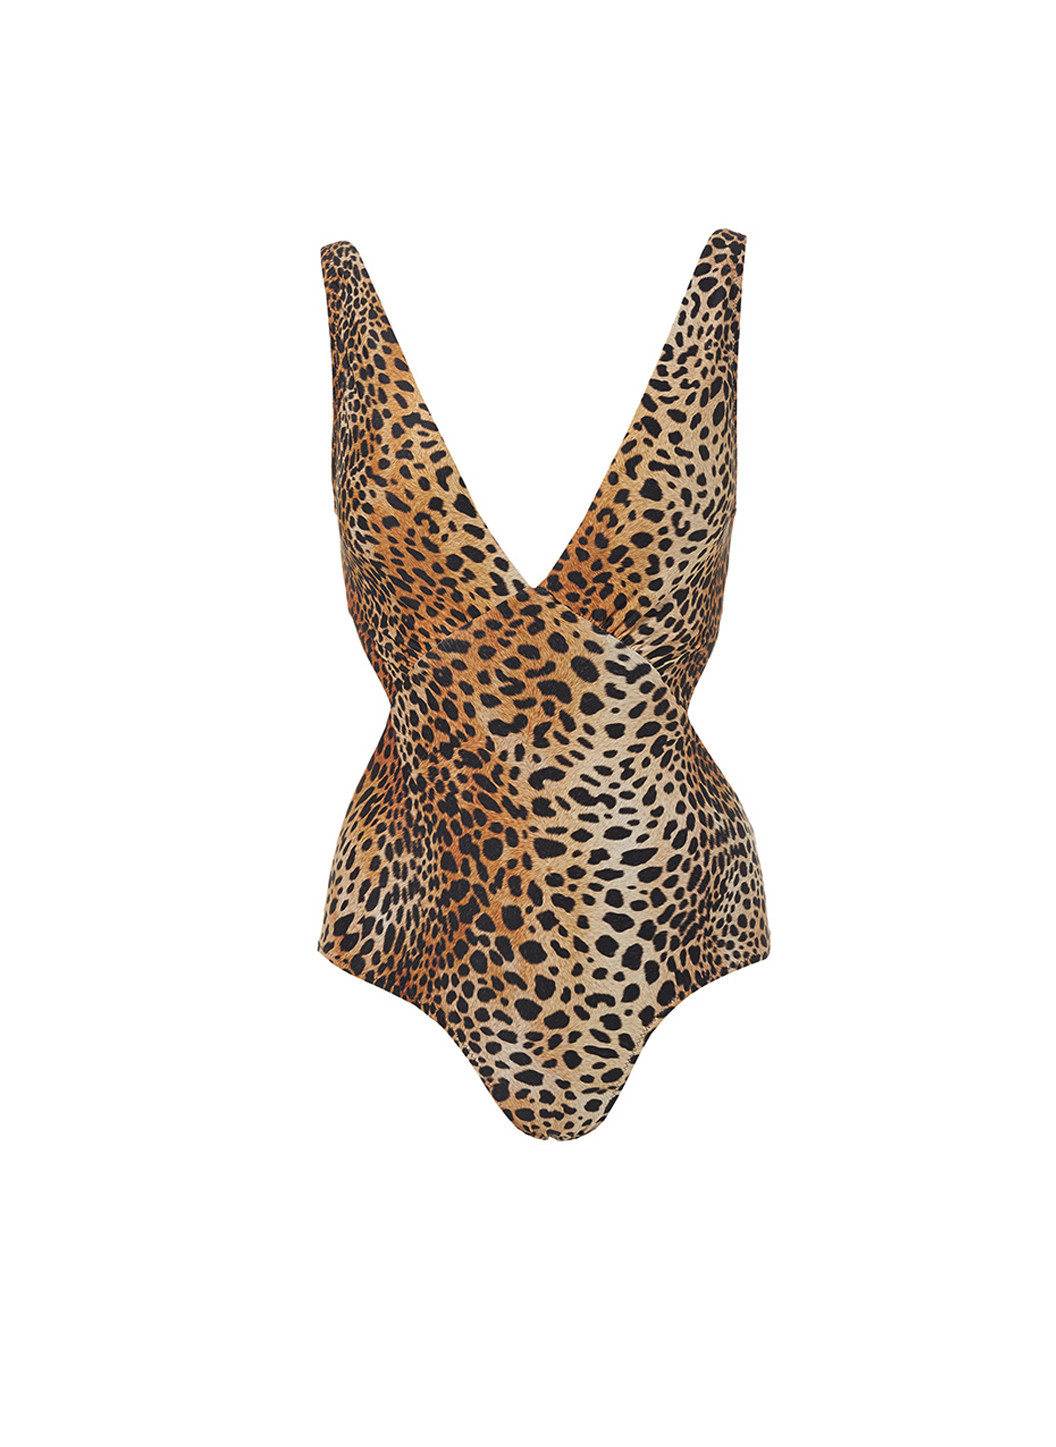 delmar-cheetah-overtheshoulder-vneck-cutout-onepiece-swimsuit-2019